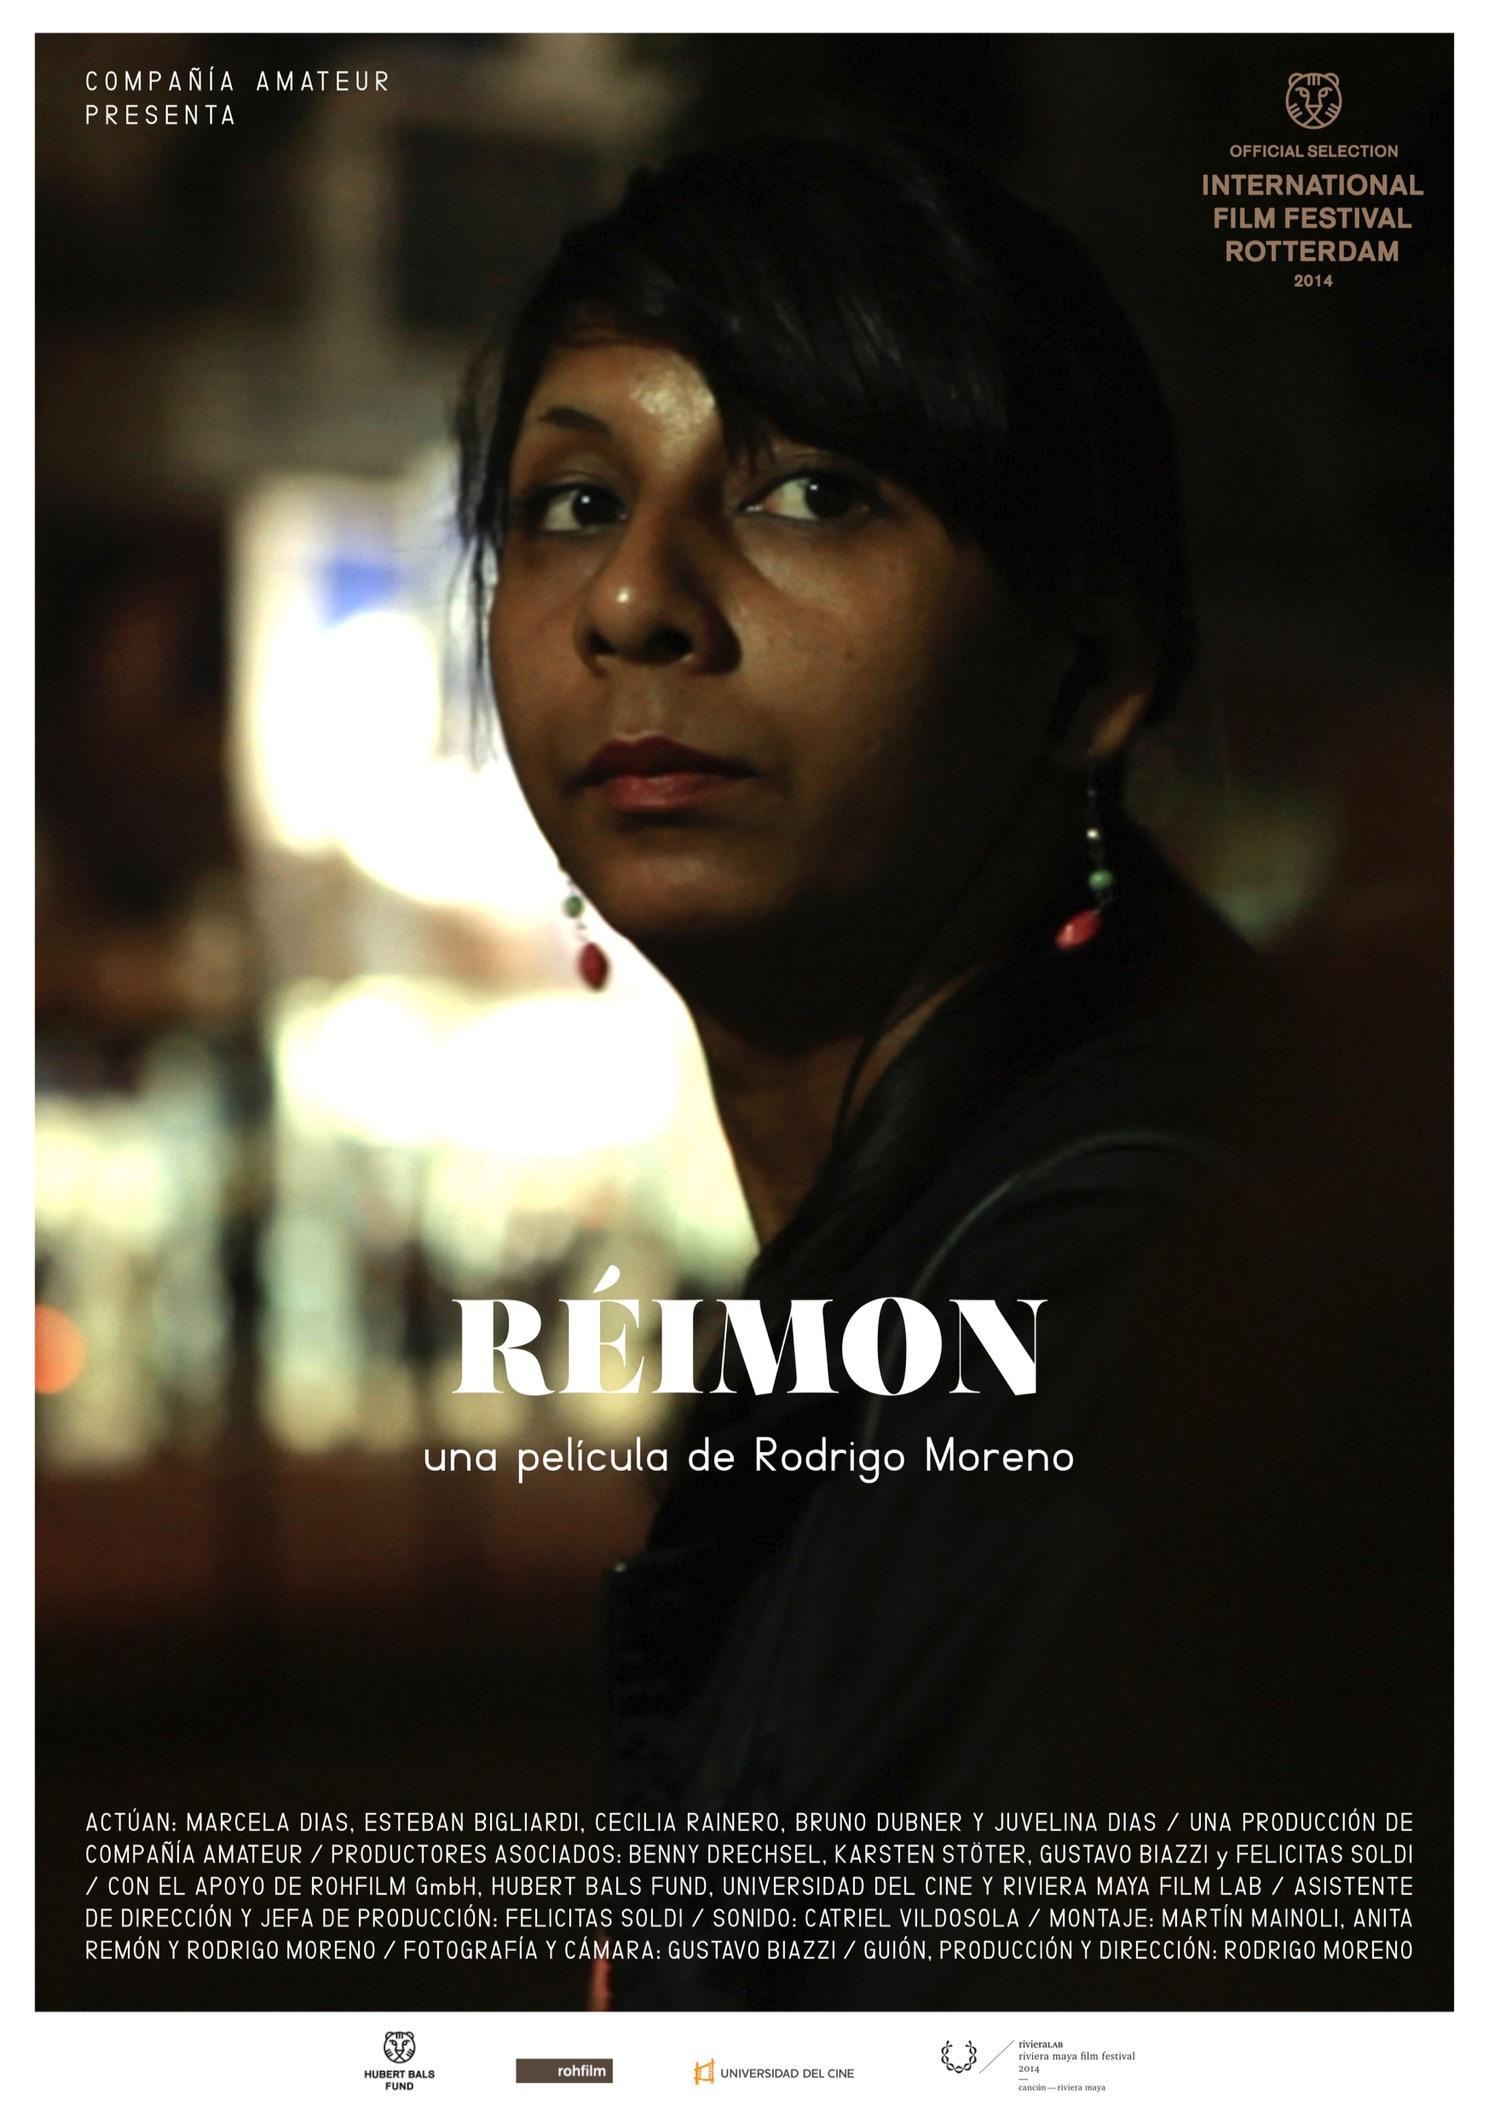 Reimon cartel.JPG